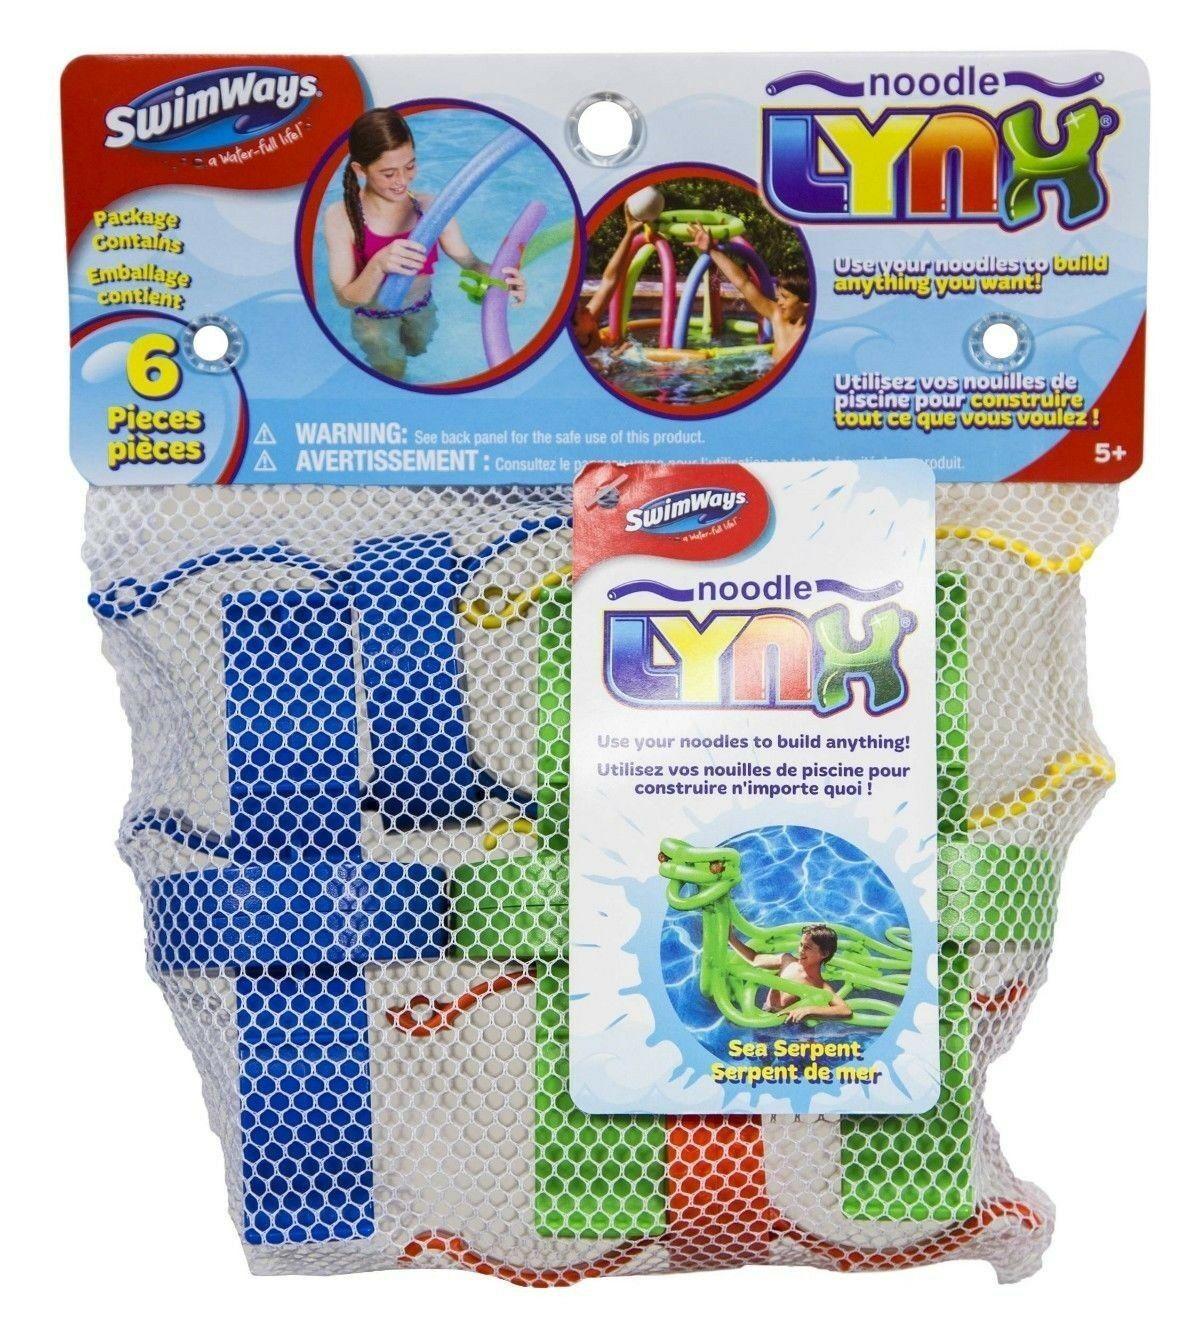 SwimWays Pool Noodle LYNX Links Connectors Pool Toys 6-pack Playset NIP